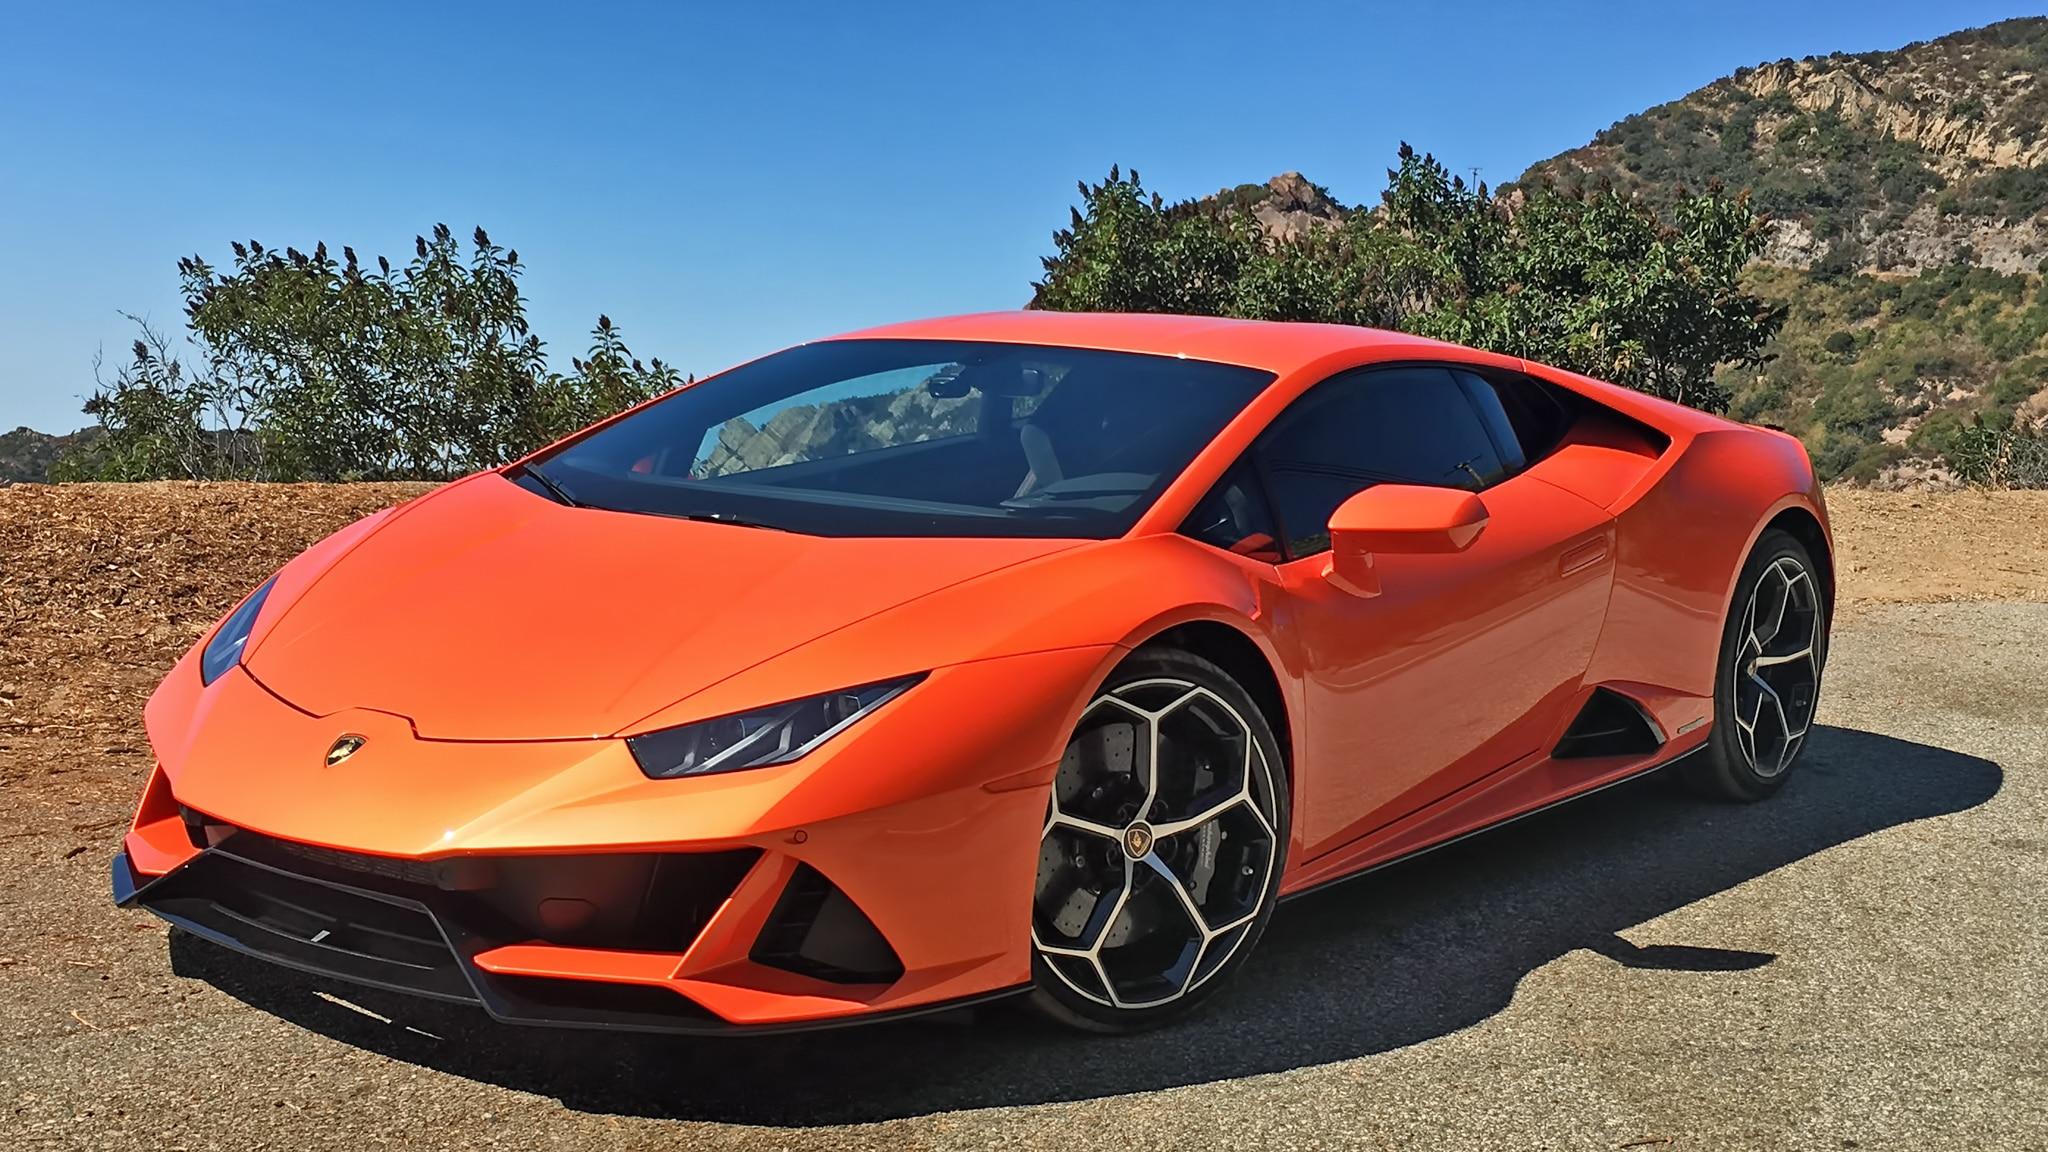 2020 Lamborghini Huracán Evo Review A Brain Blender